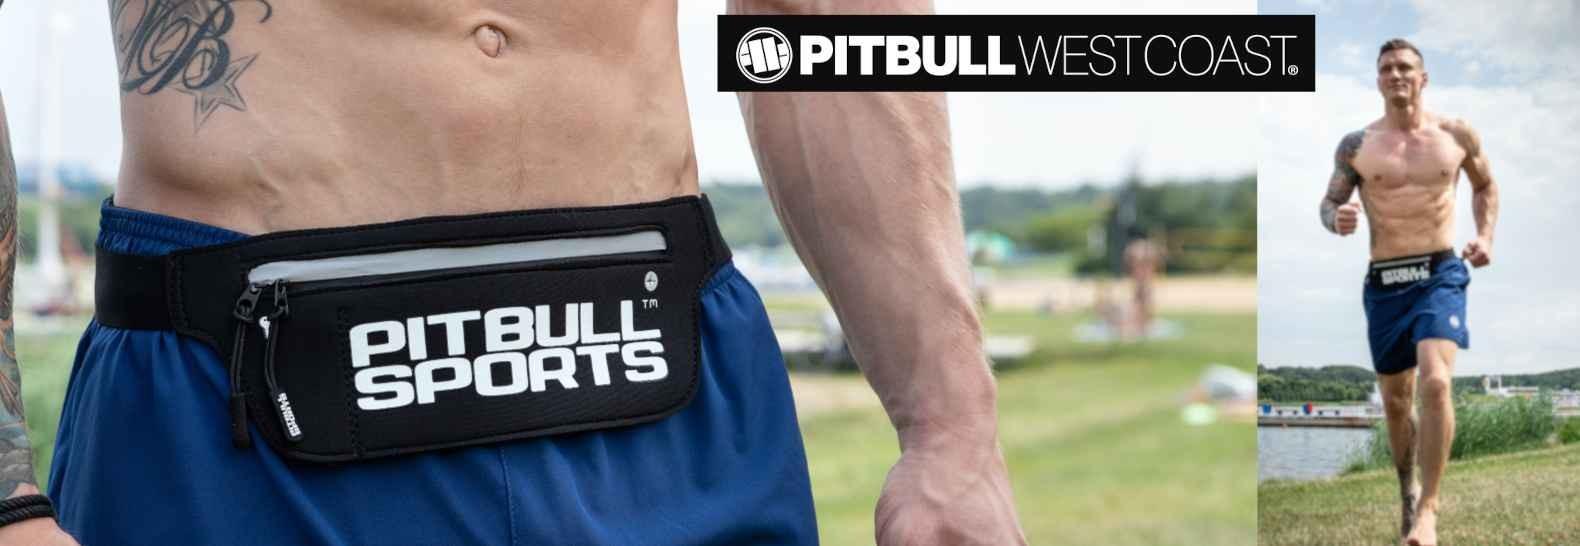 Saszetka nerka Pit Bull West Coast model Pitbull Sports